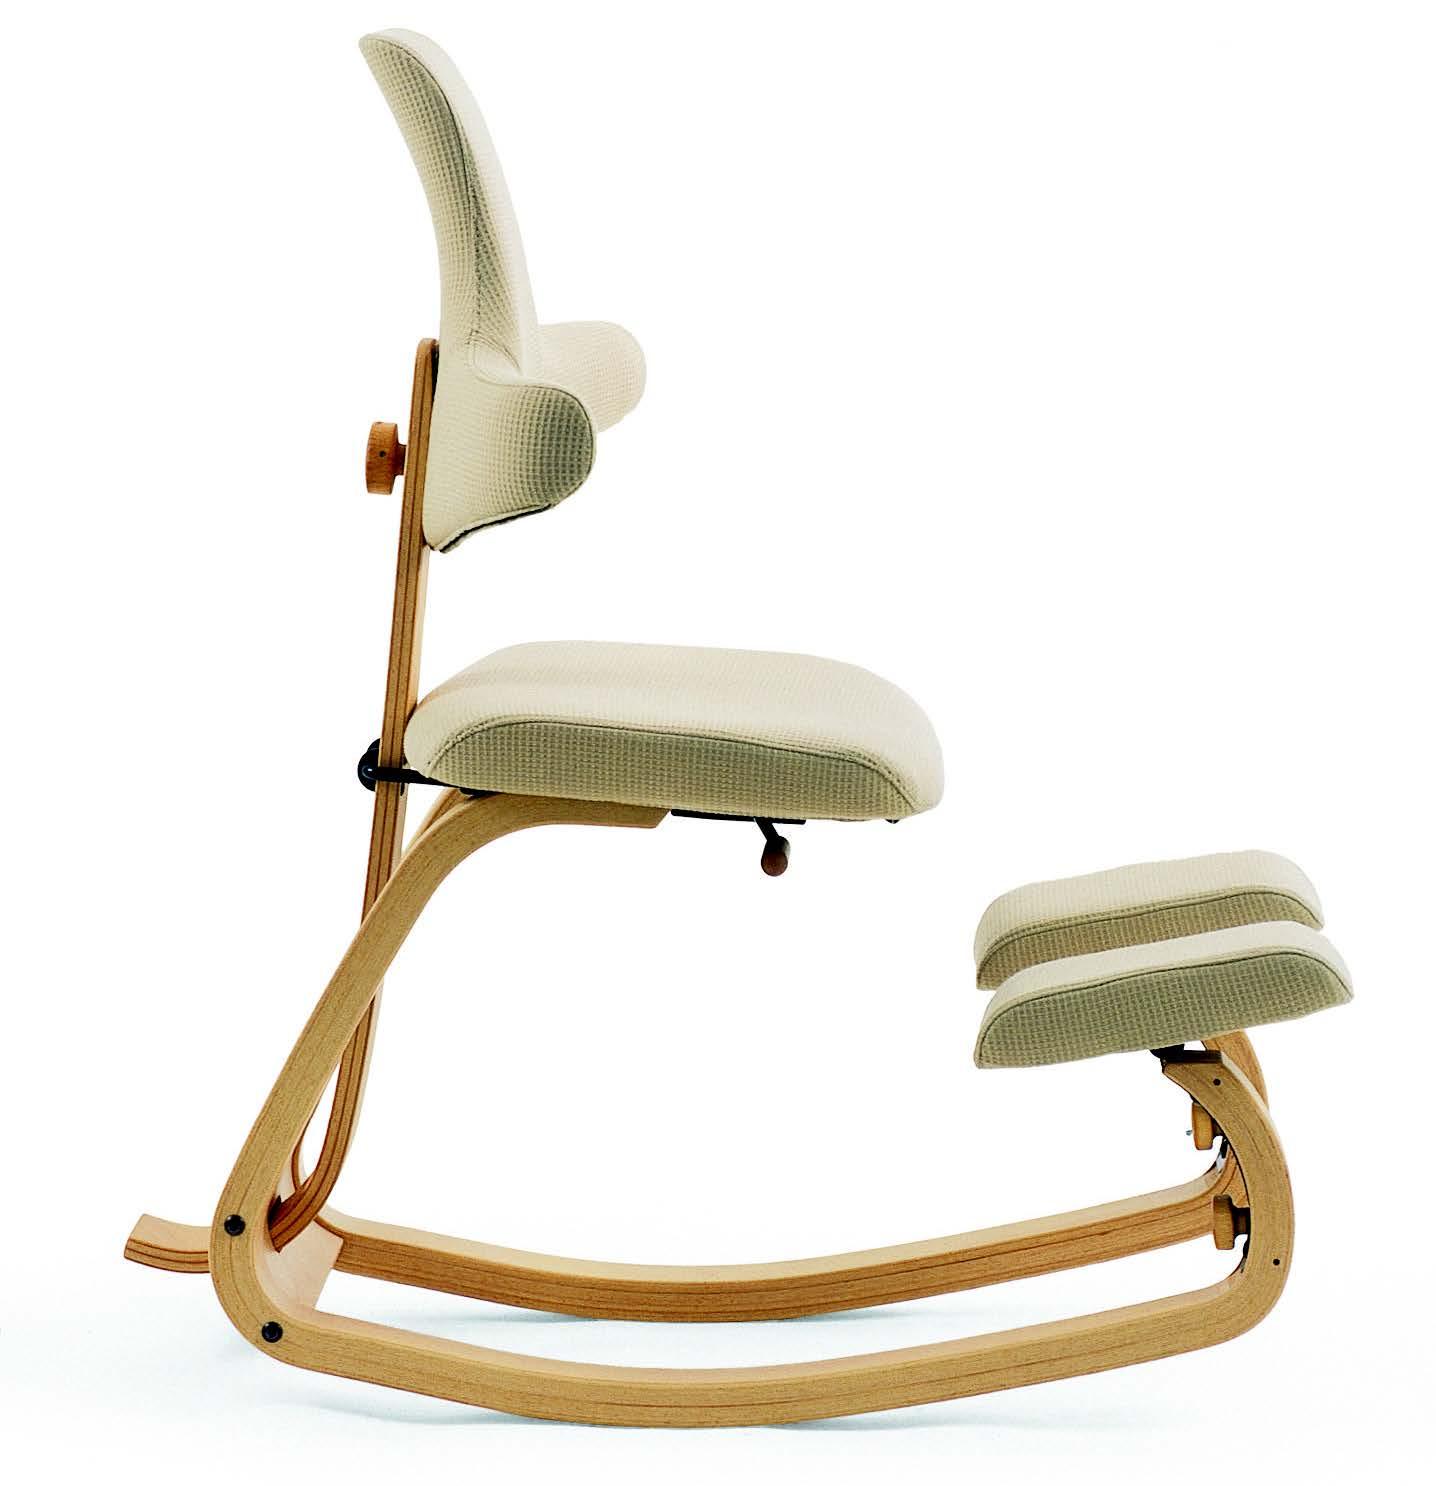 Sedia ergonomica thatsit galimberti sedie e tavoli for Galimberti sedie